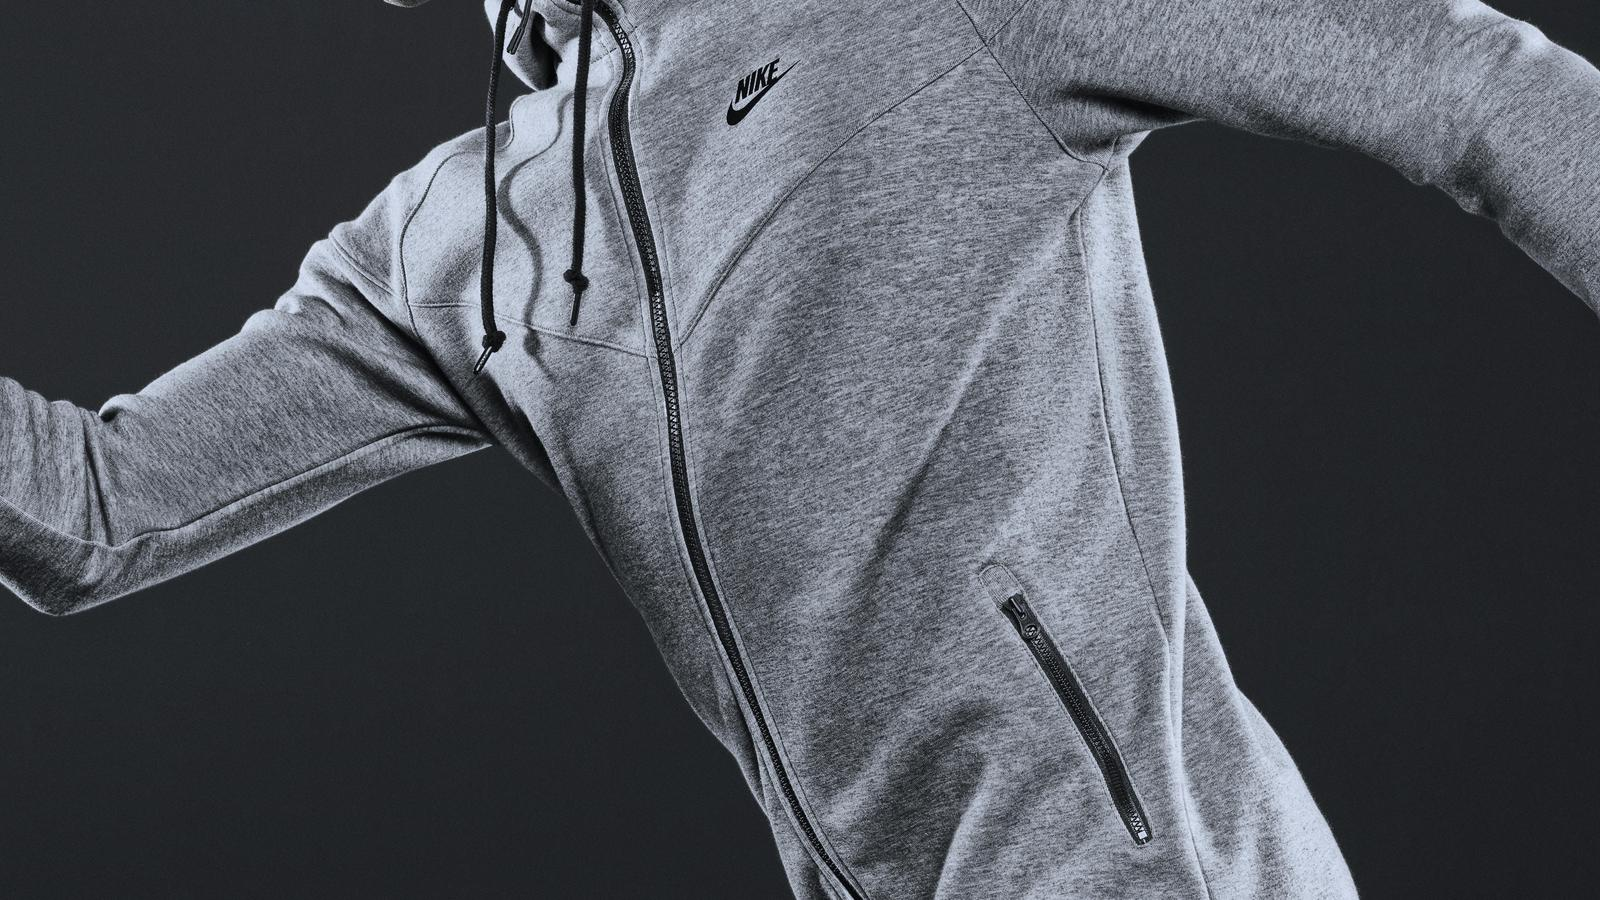 Nike Tech Pack: Tech Fleece - Nike News